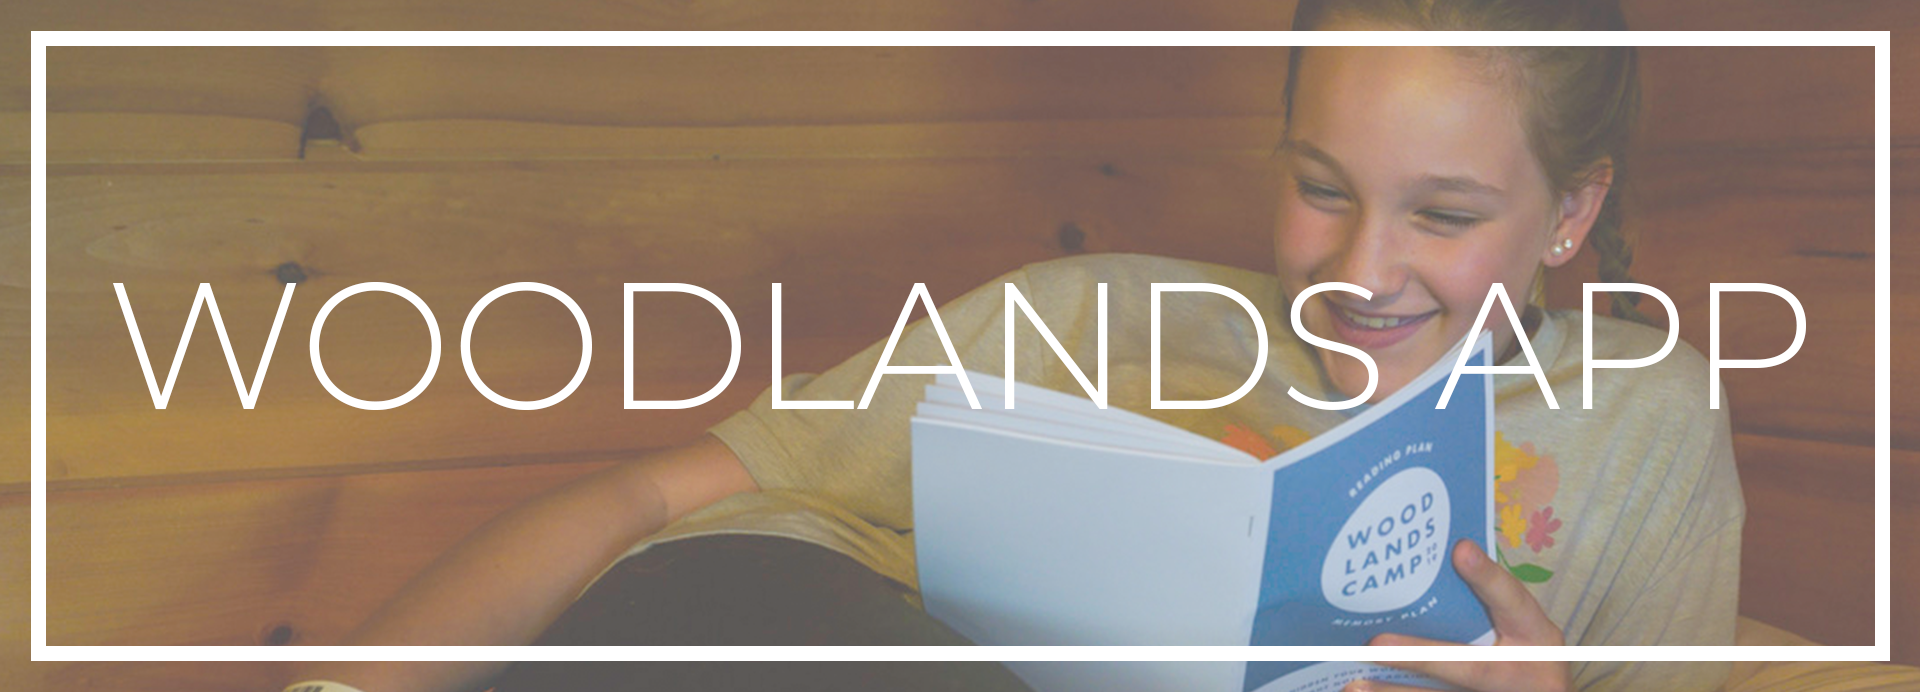 WOODLANDS APP.png